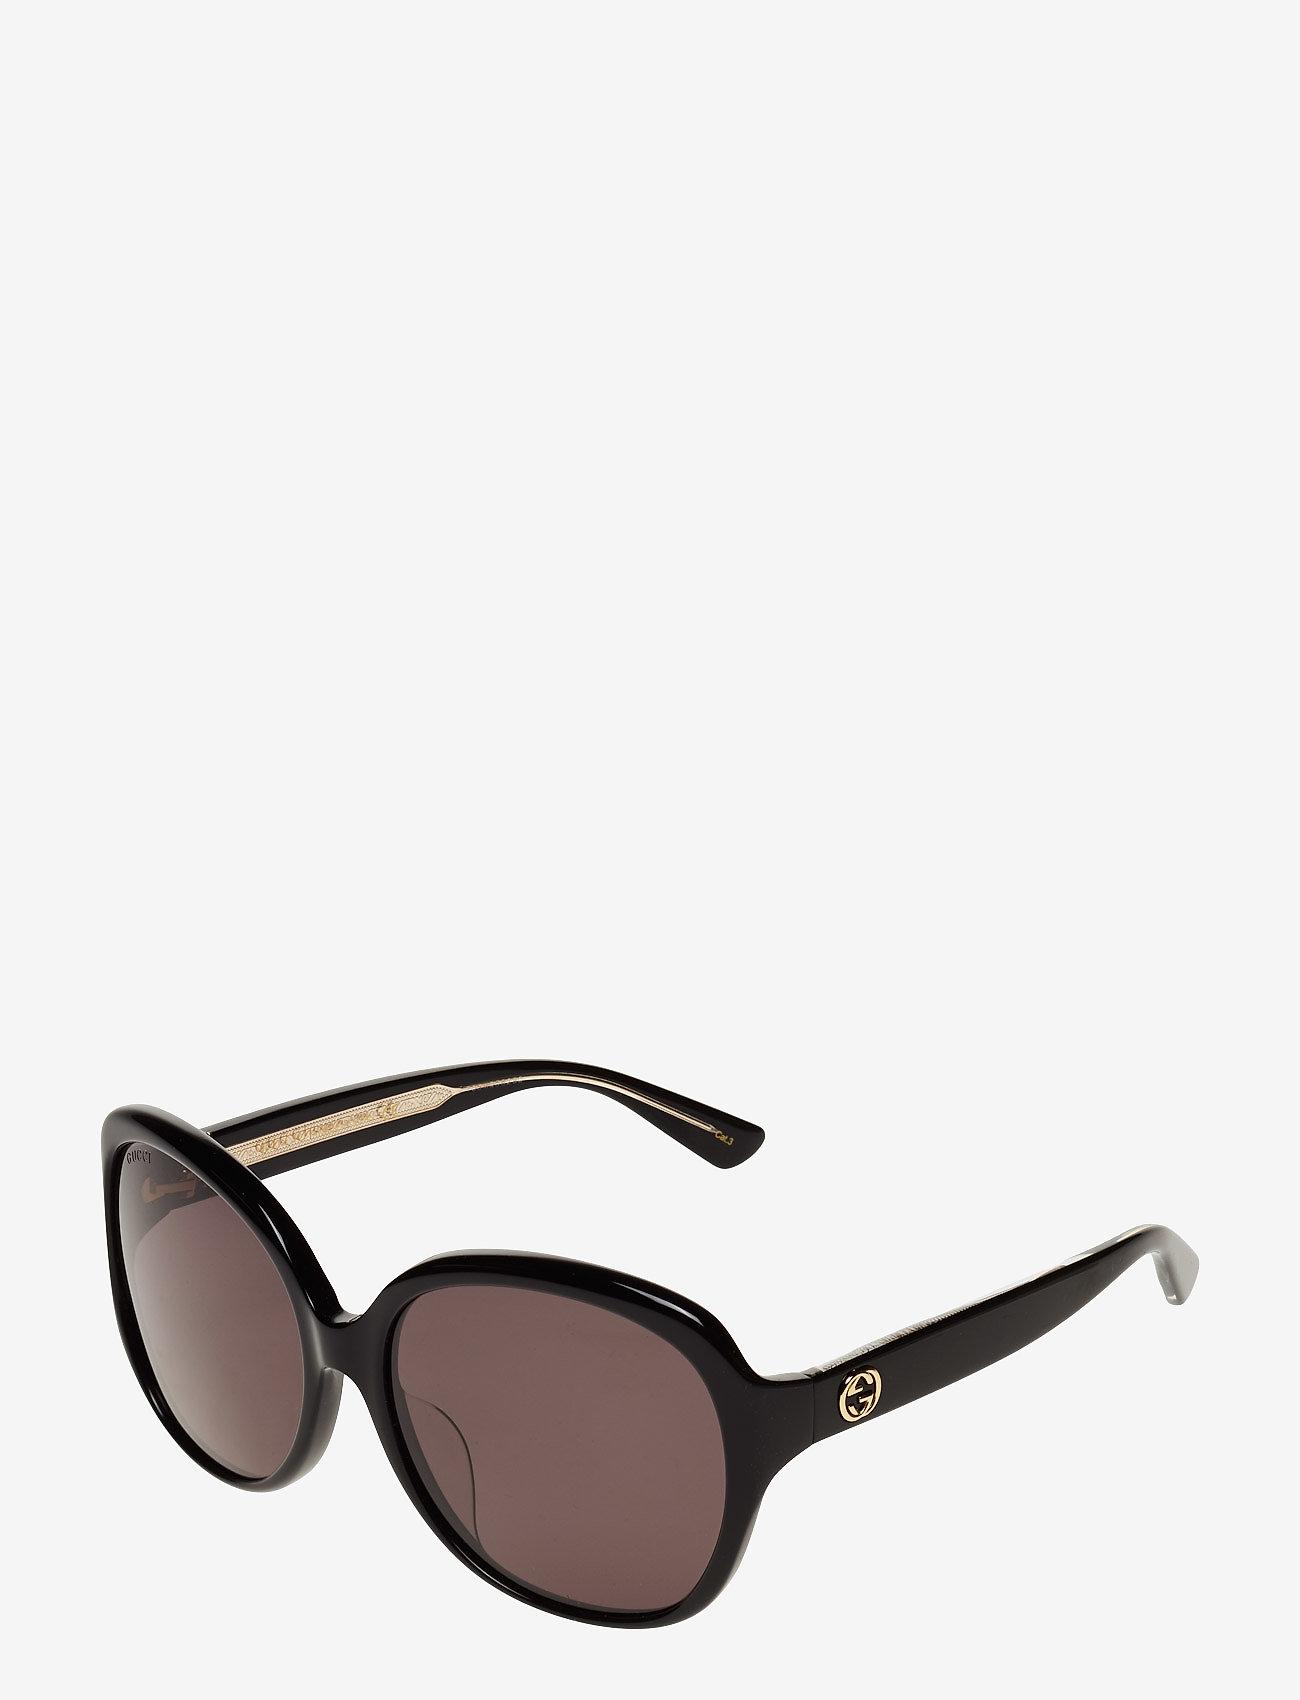 Gucci Sunglasses - GG0080SK - round frame - black-black-grey - 1